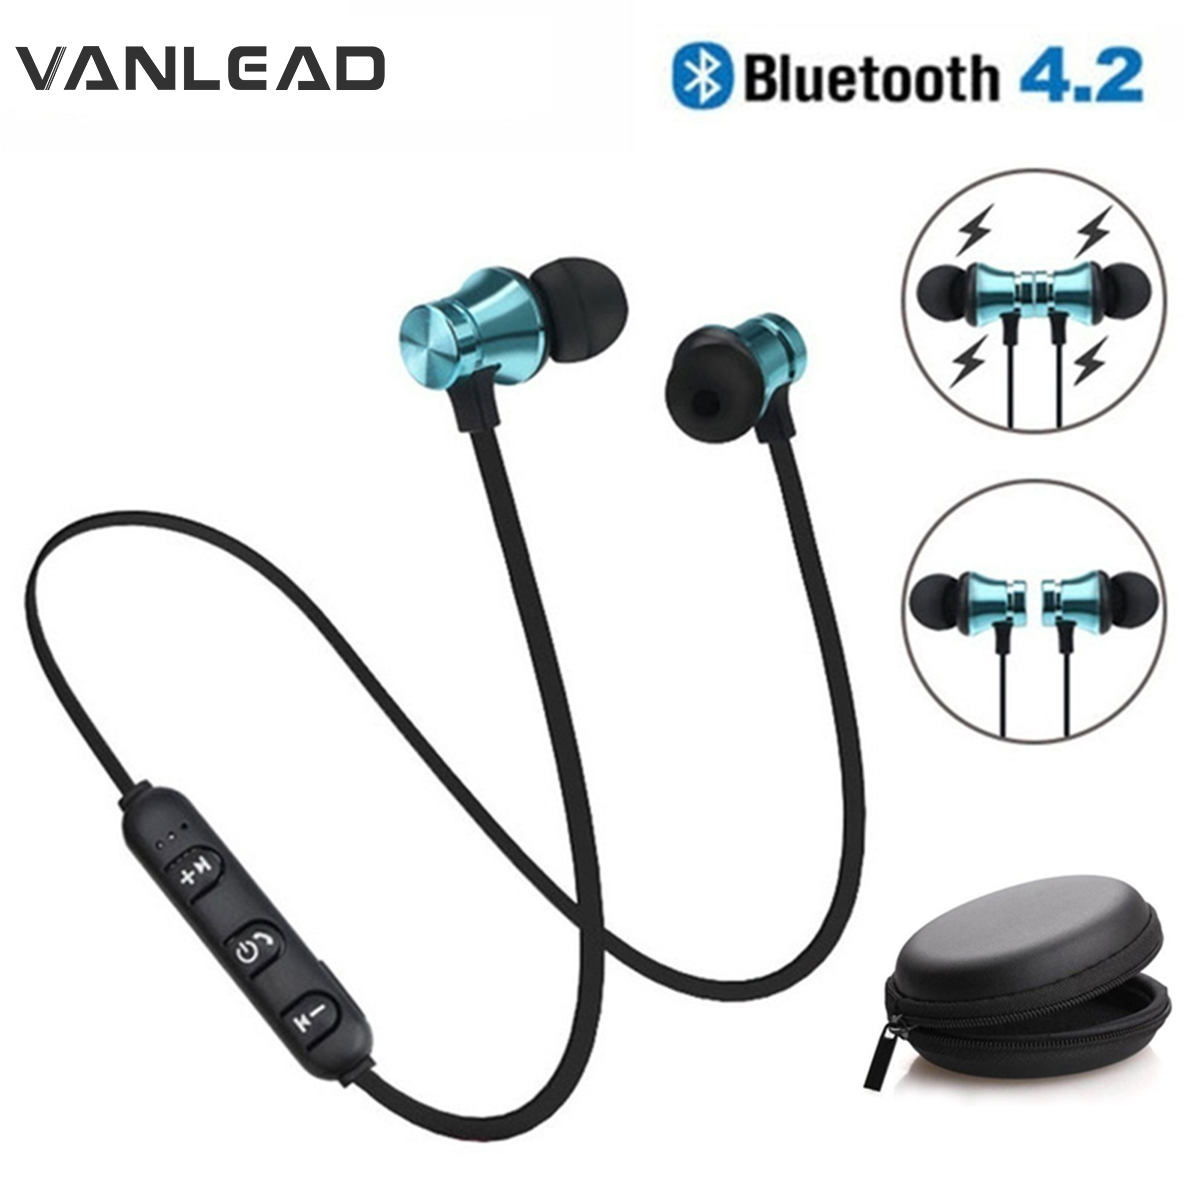 Magnetic Wireless Bluetooth Earphone In-Ear With Mic Sports Waterproof Music Earplugs Gift Headset For IPhone 6s Plus Samsung 8